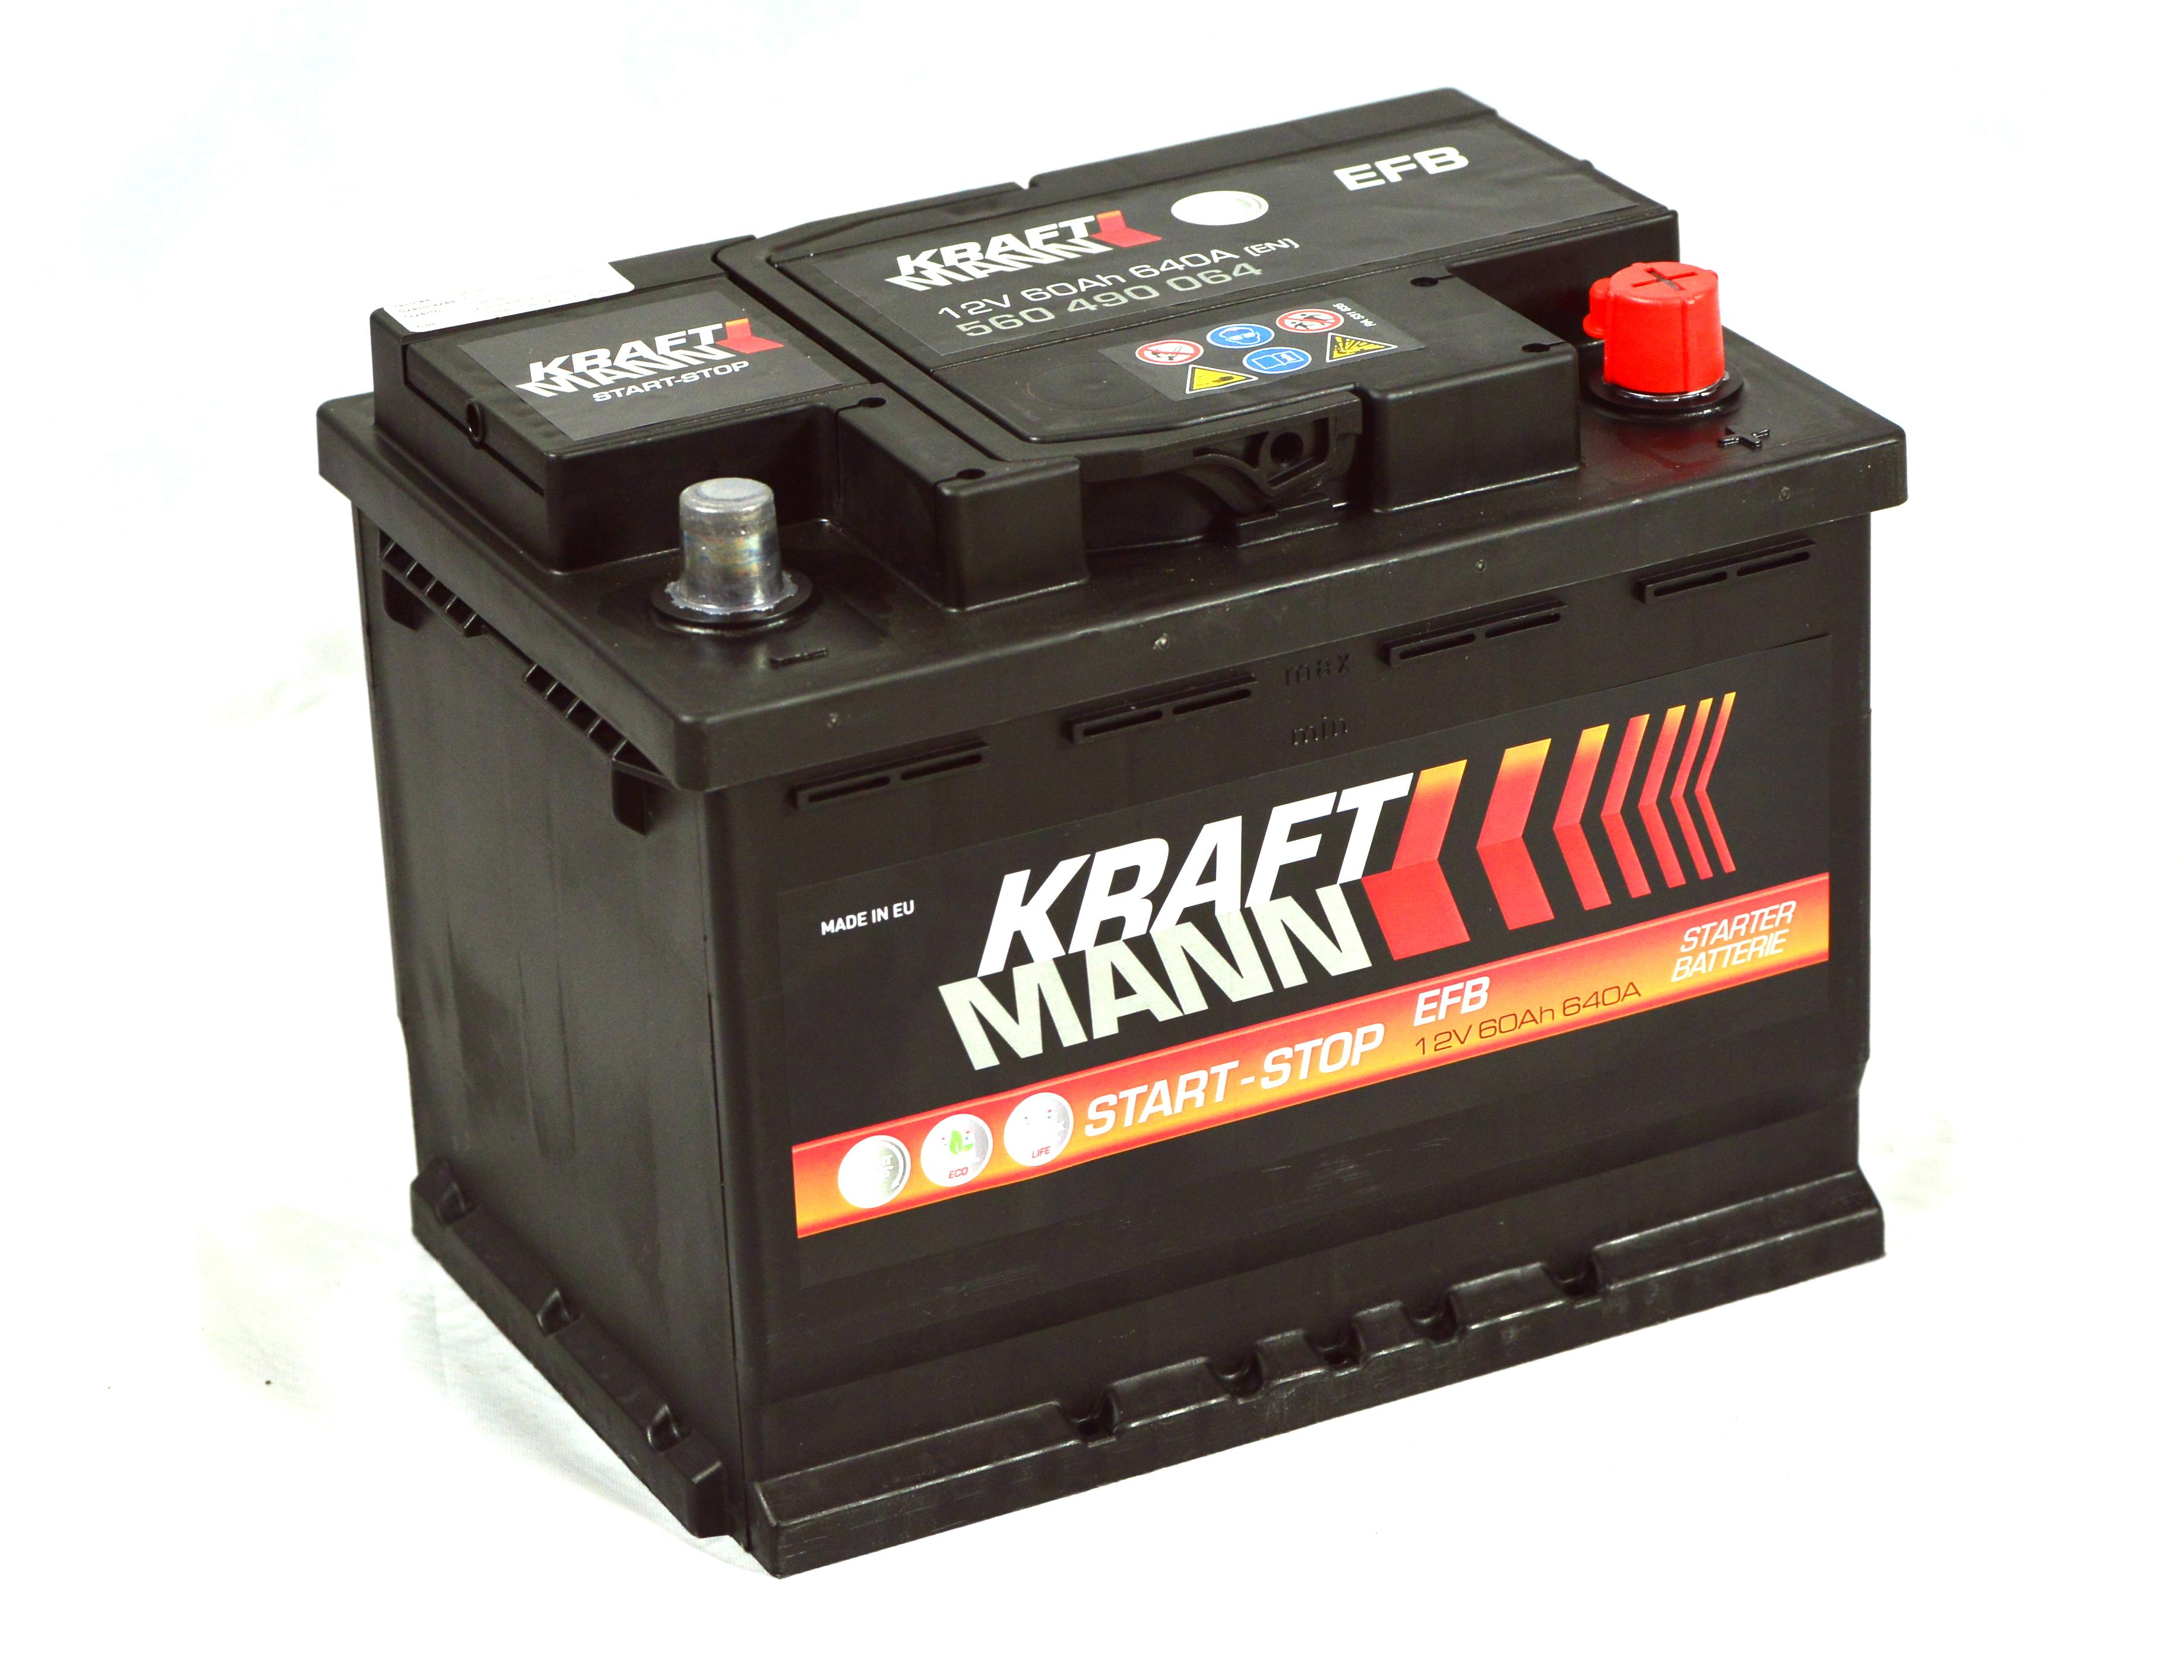 Kraftmann-EFB--12v-60ah-jobb-start-stop--auto-akkumulator-